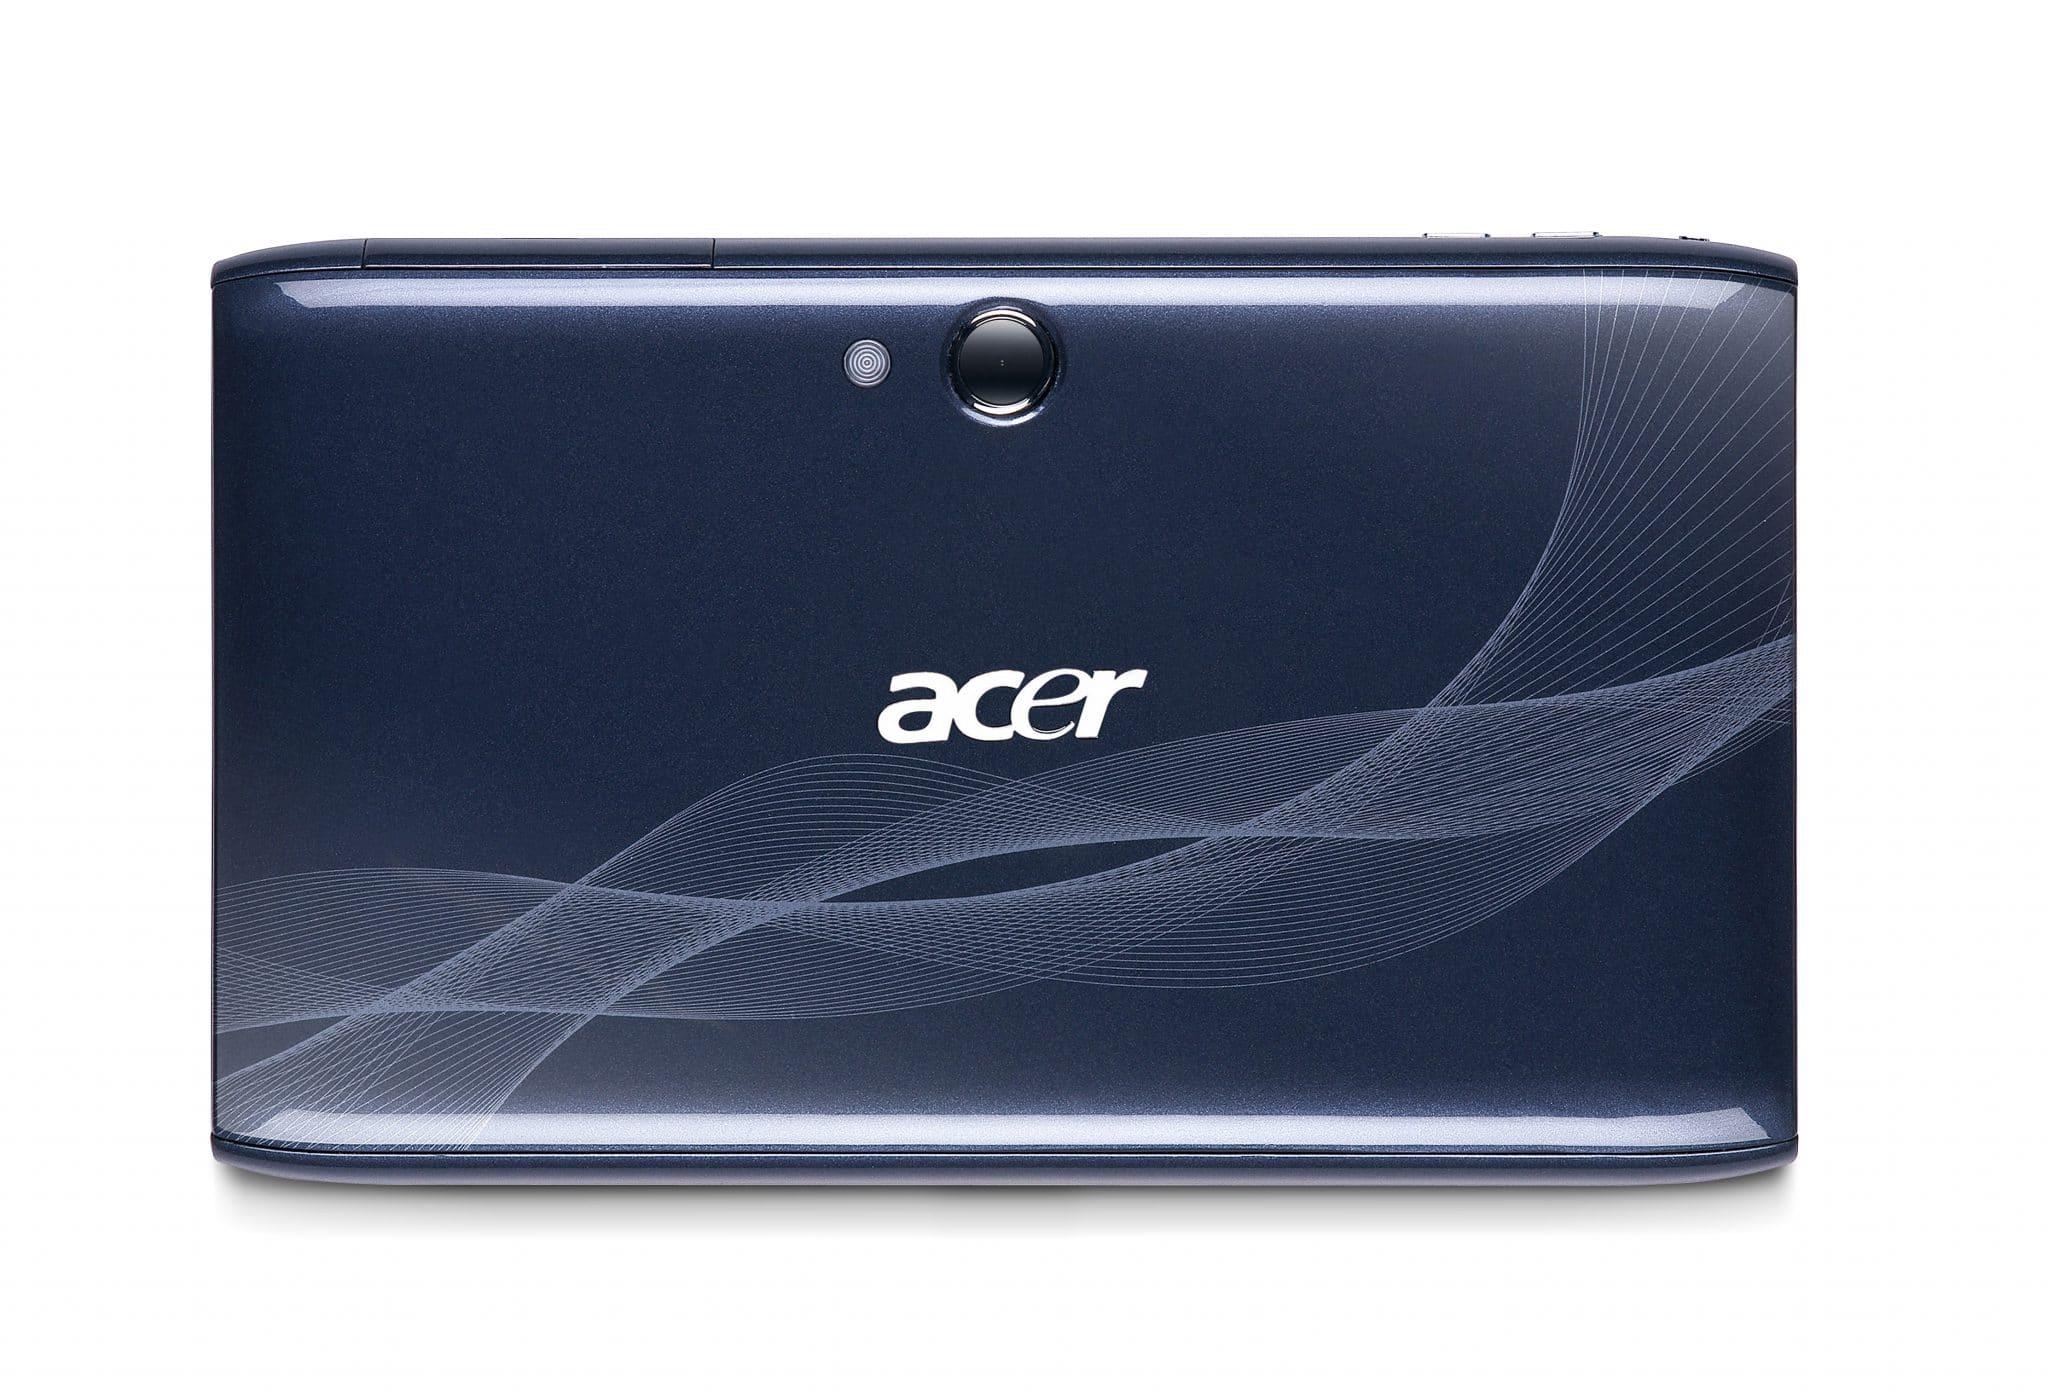 Acer iconia tab a100 характеристики - 8c922